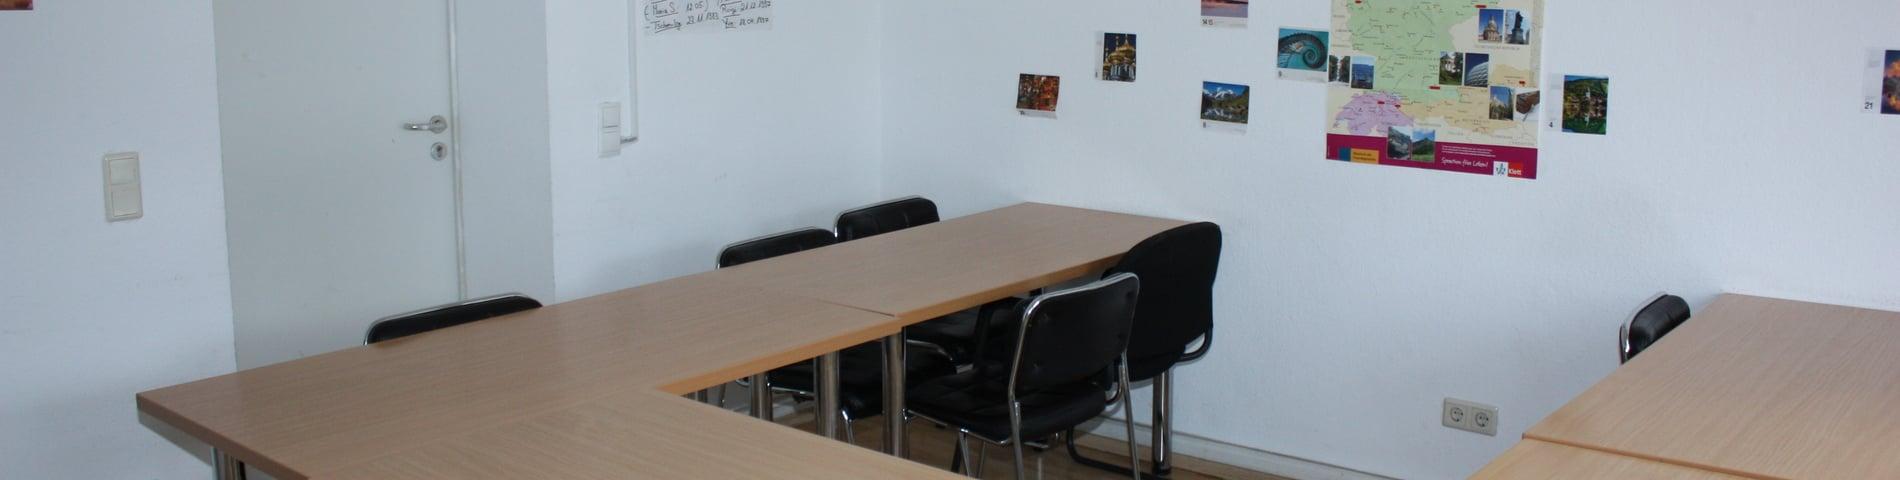 Steinke Institut picture 1